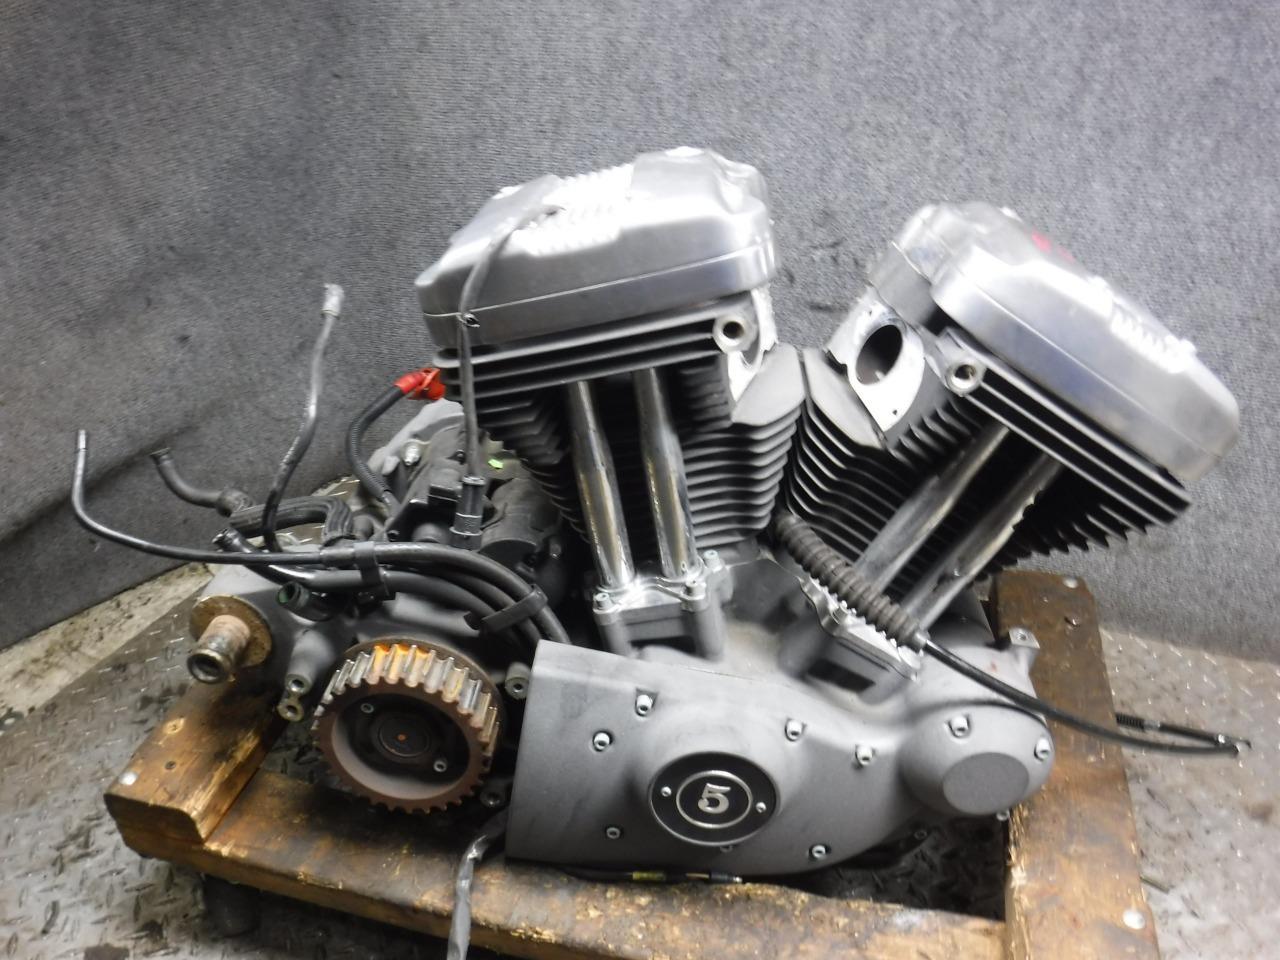 07 Harley Sportster XL 1200 XL1200 Engine Motor 72D | eBay